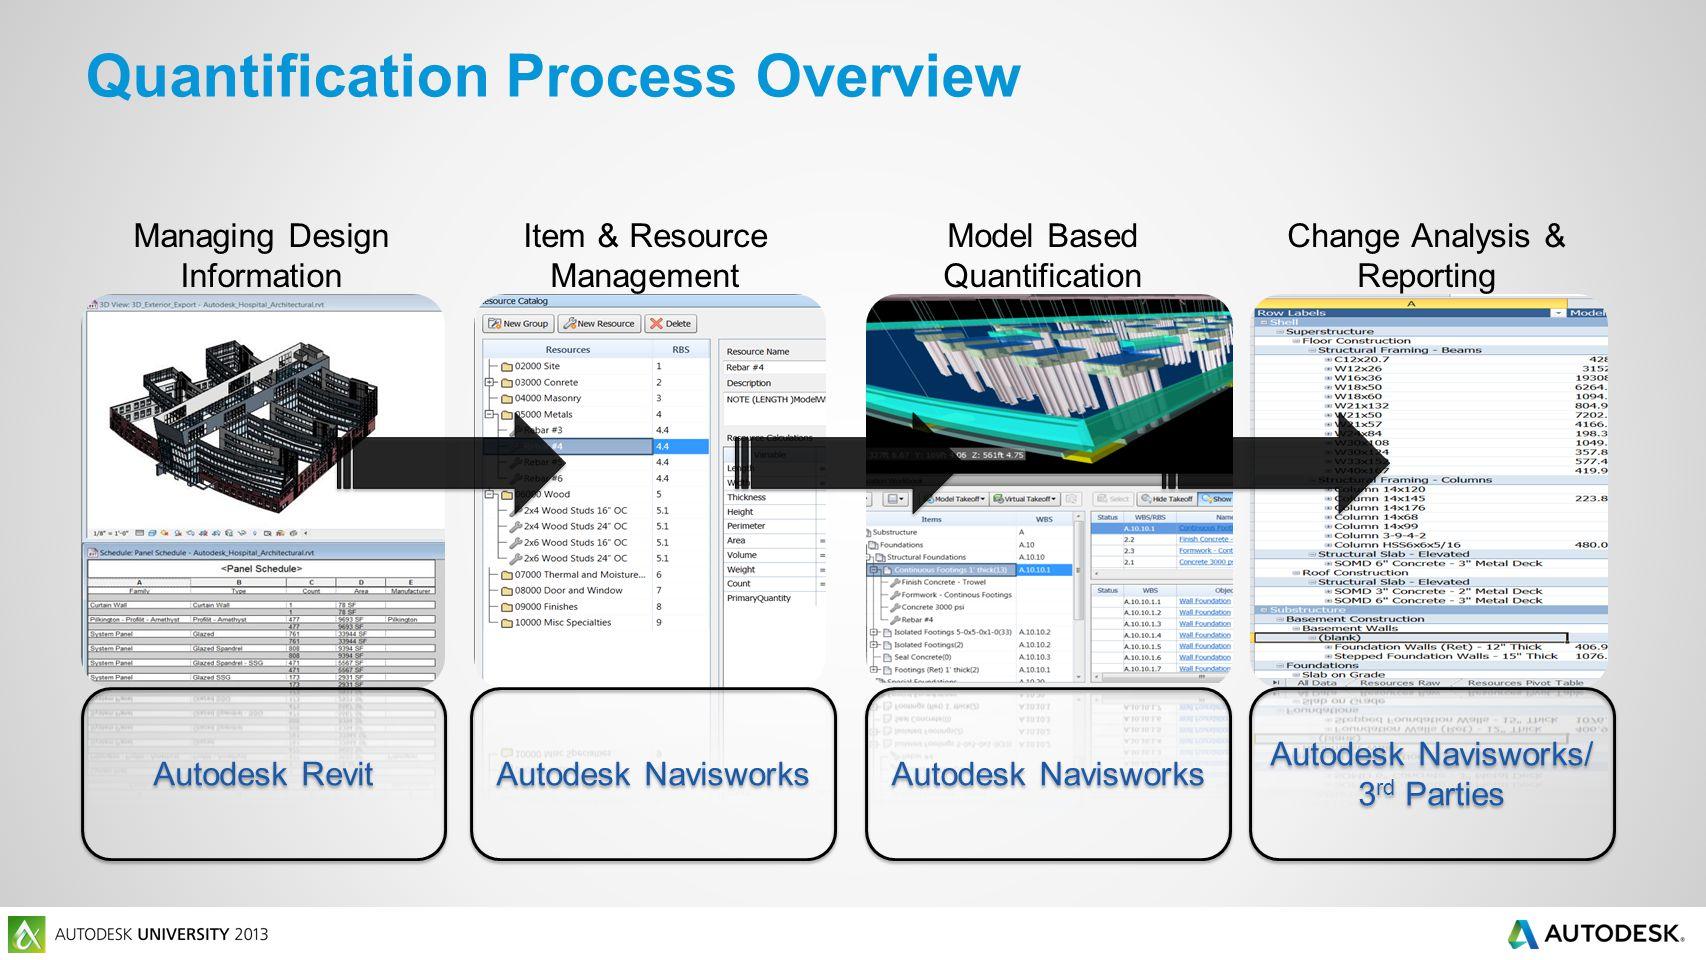 Quantification Process Overview Managing Design Information Autodesk Revit Item & Resource Management Autodesk Navisworks Model Based Quantification A